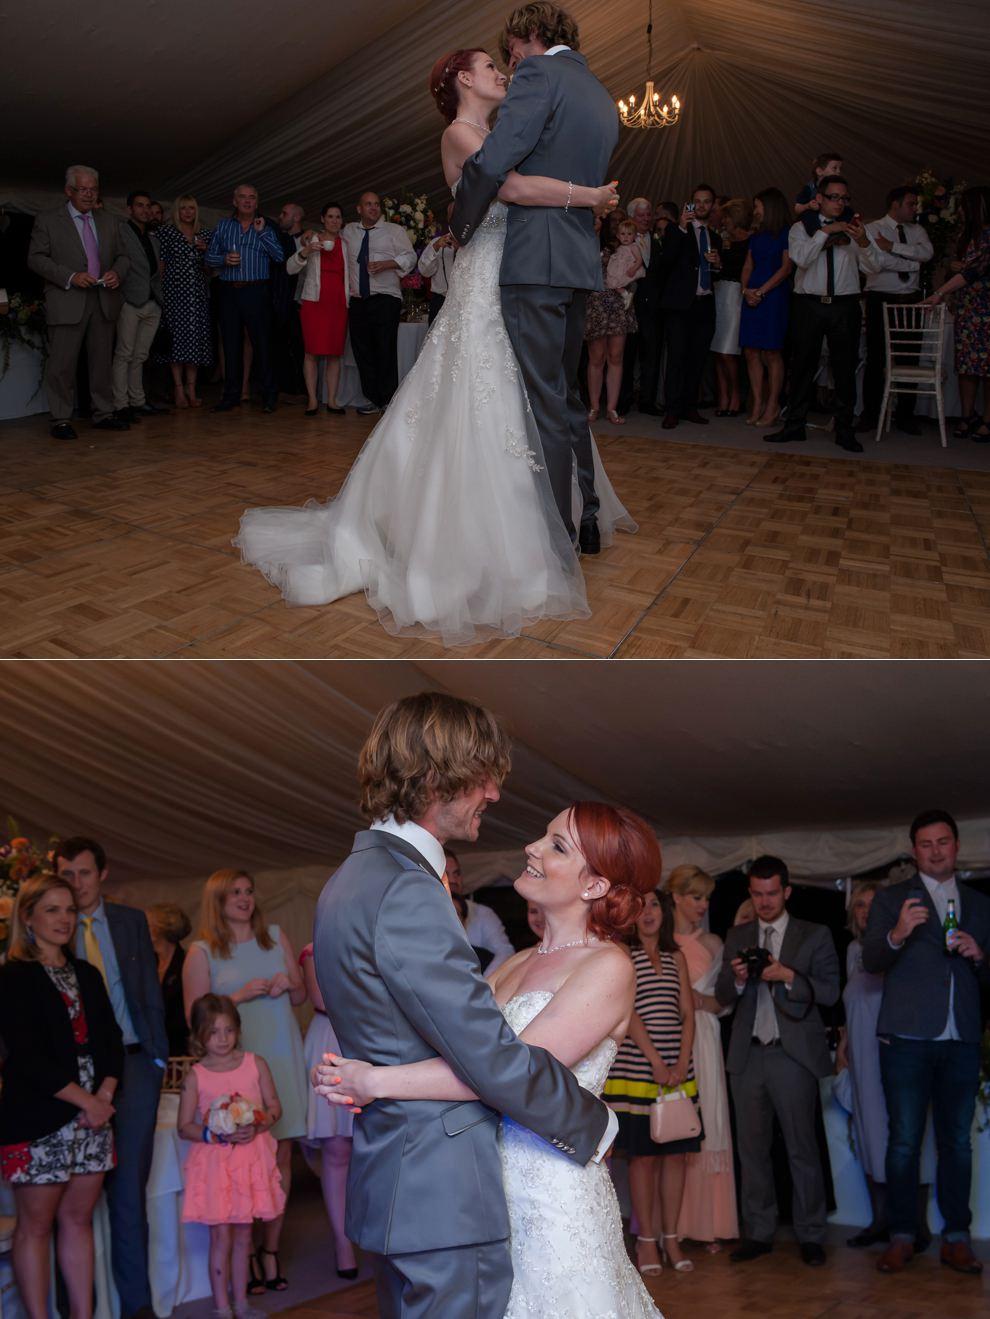 Debi Paul Wedding Photographer Hertfordshire (38)